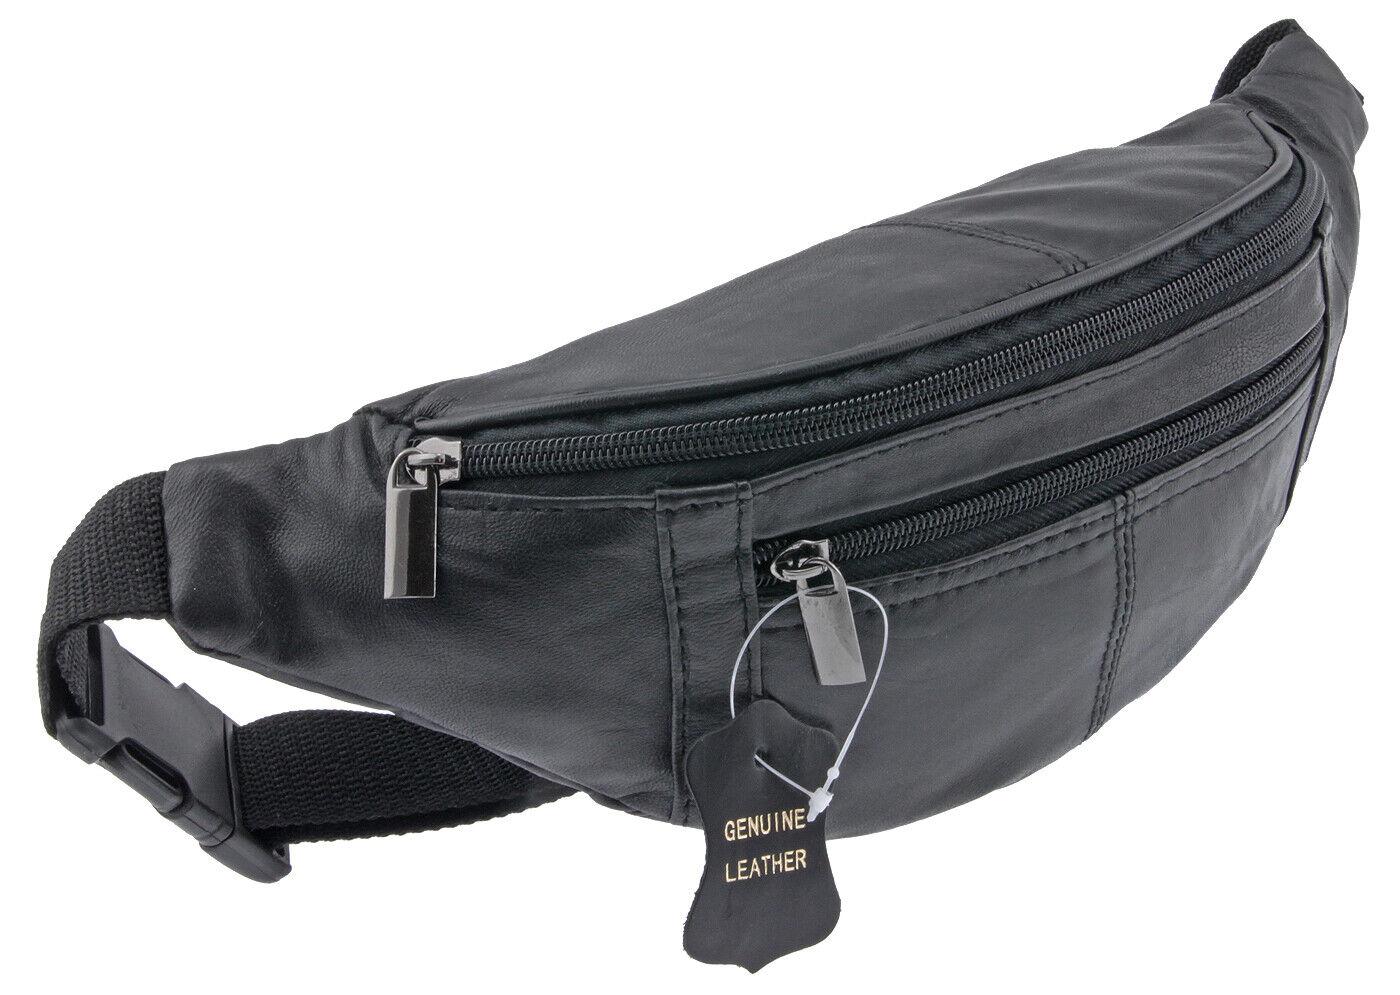 Gürteltasche Hüfttasche Bauchtasche Umhängetasche Crossbag - Echt Leder! LK525